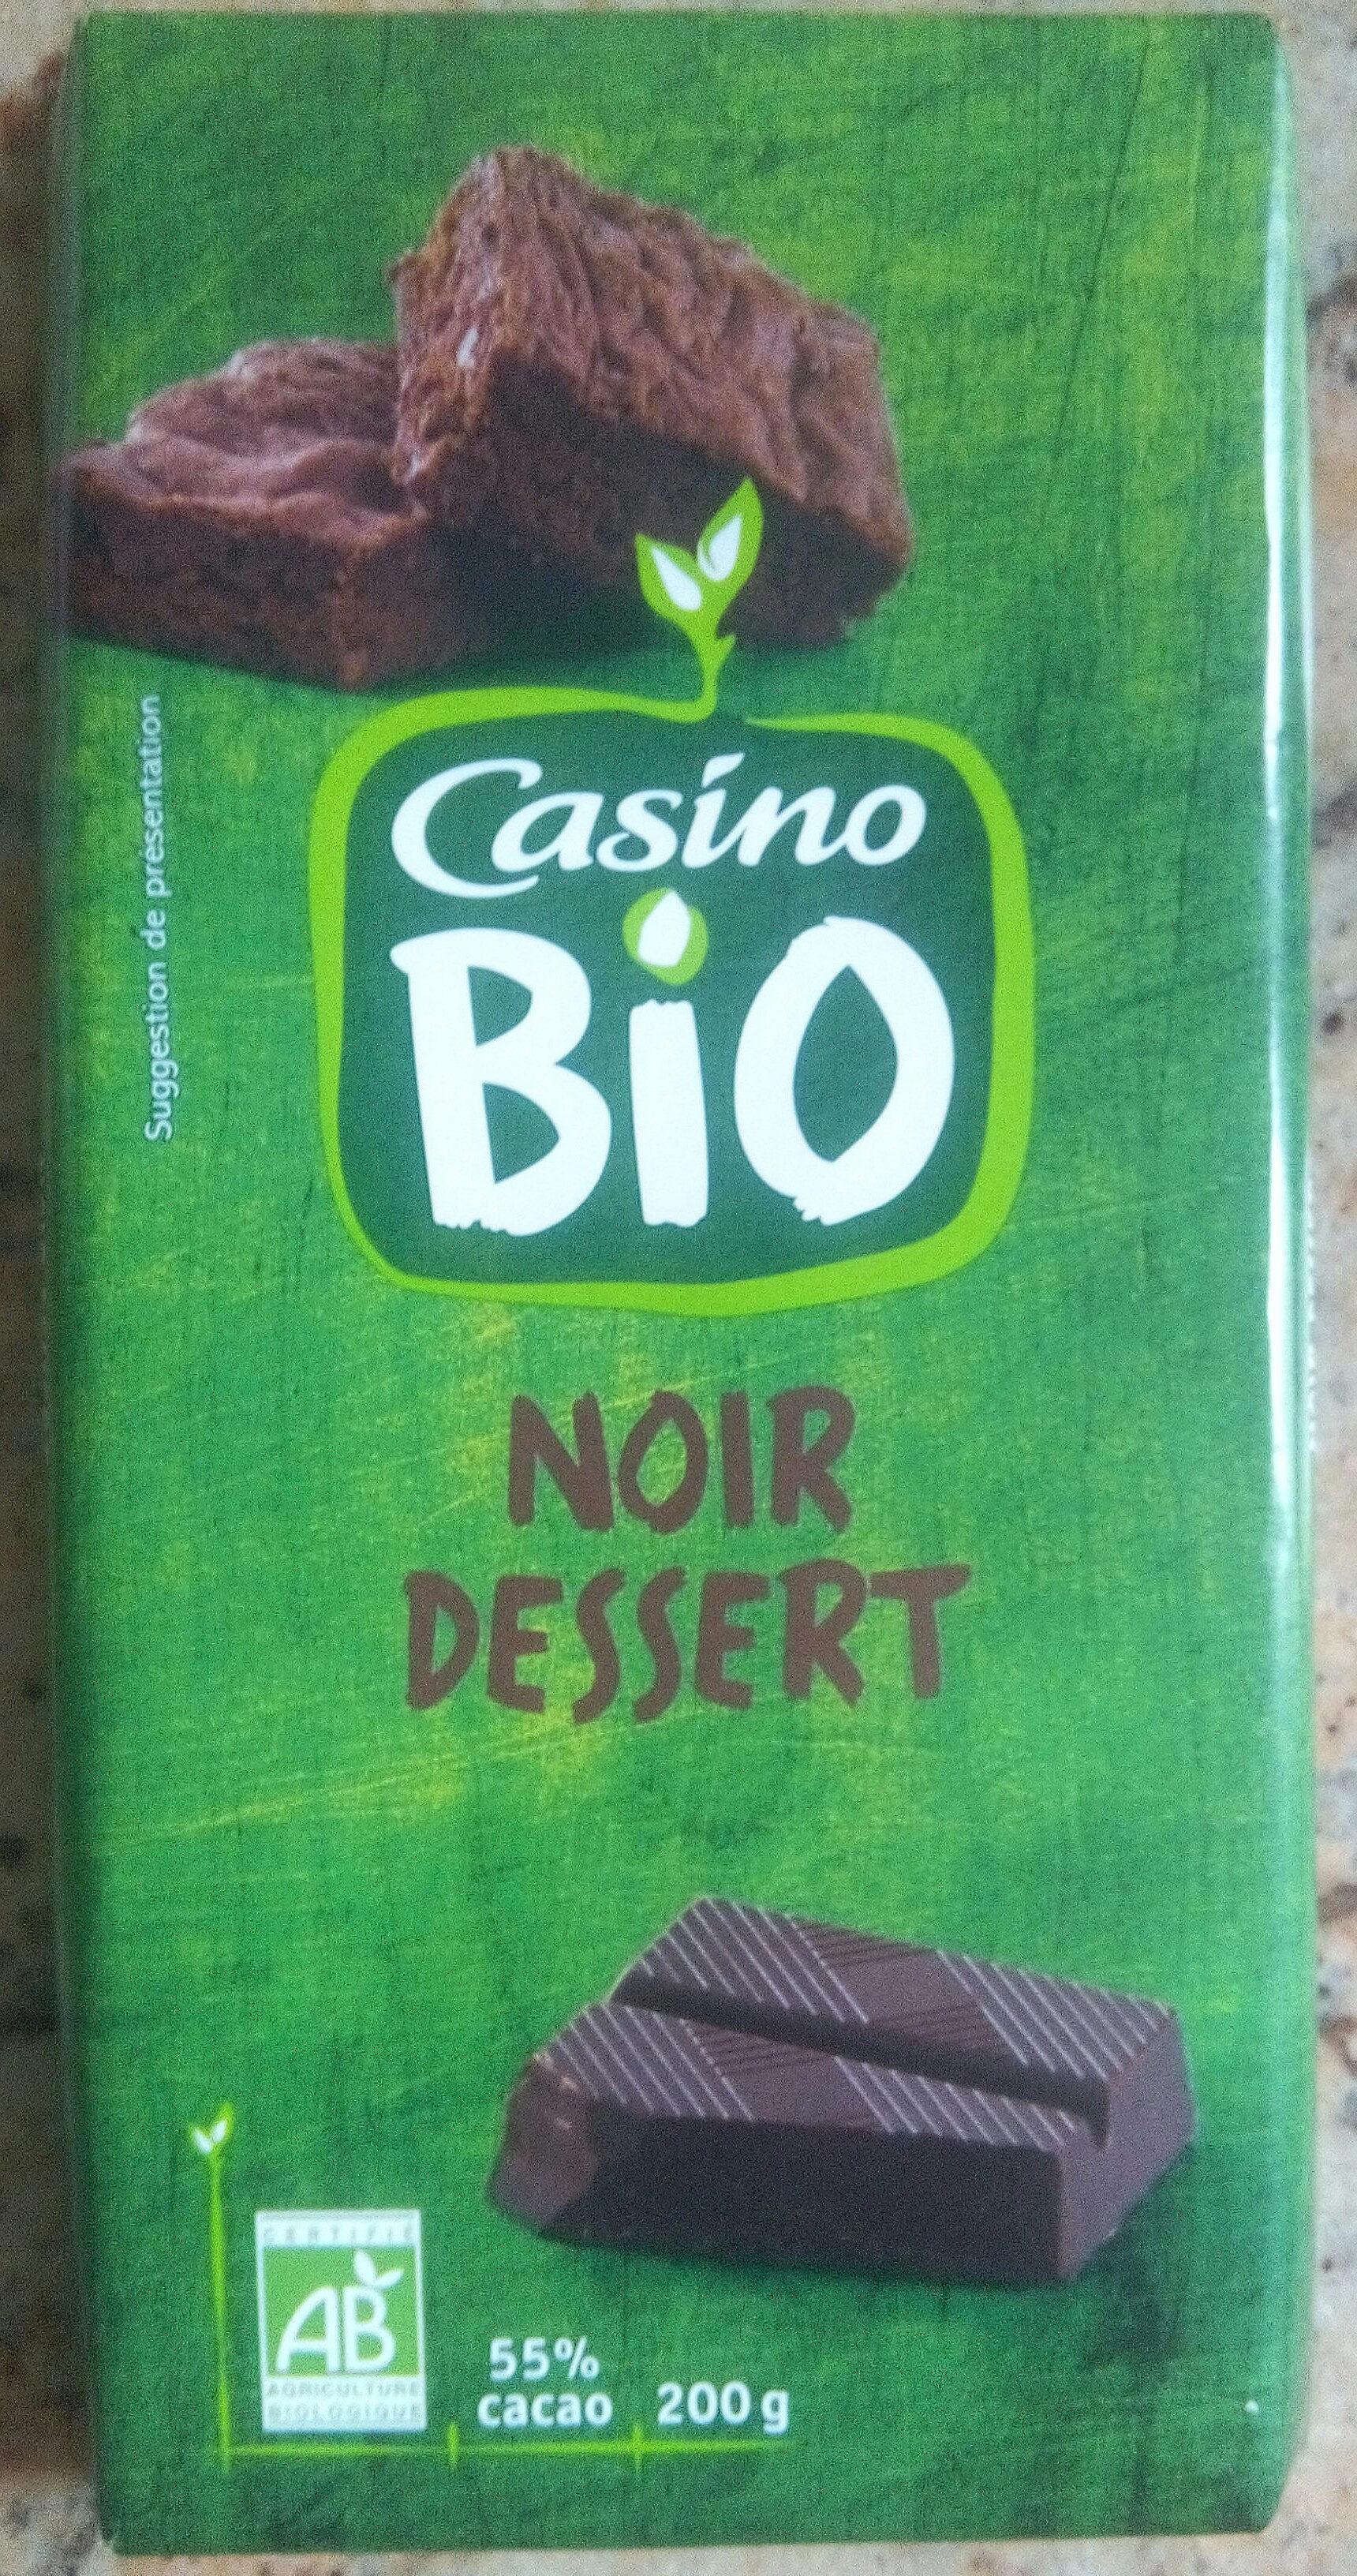 Chocolat noir dessert 55% de cacao - Product - fr